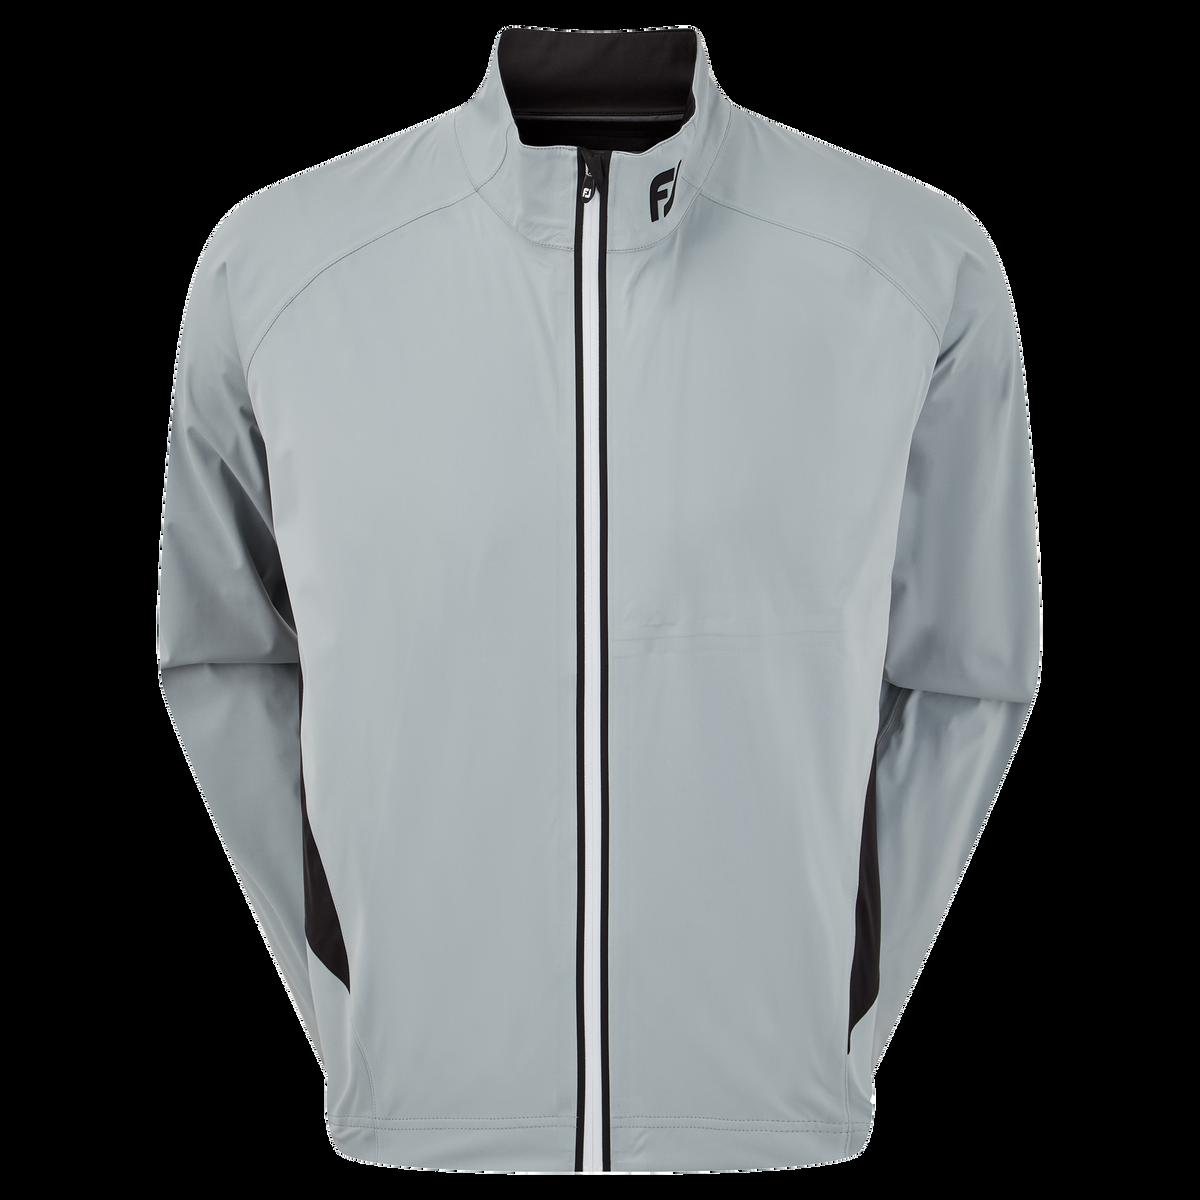 FJ HyrdoKnit Jacket